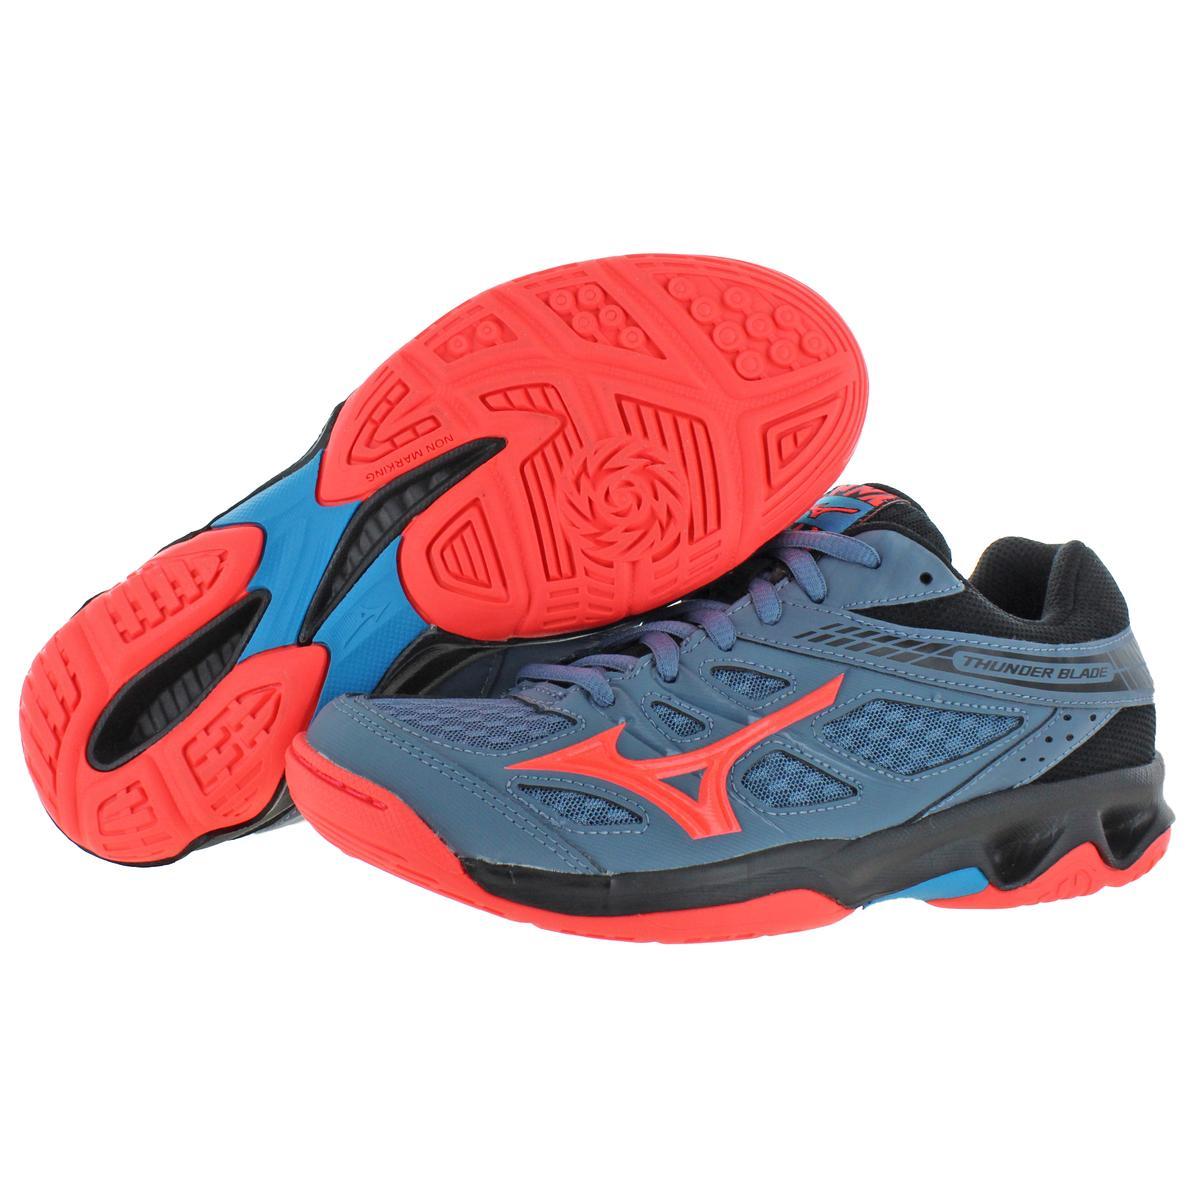 Mizuno-Womens-Thunder-Blade-Low-Top-Non-Marking-Sneakers-Shoes-BHFO-9051 thumbnail 7